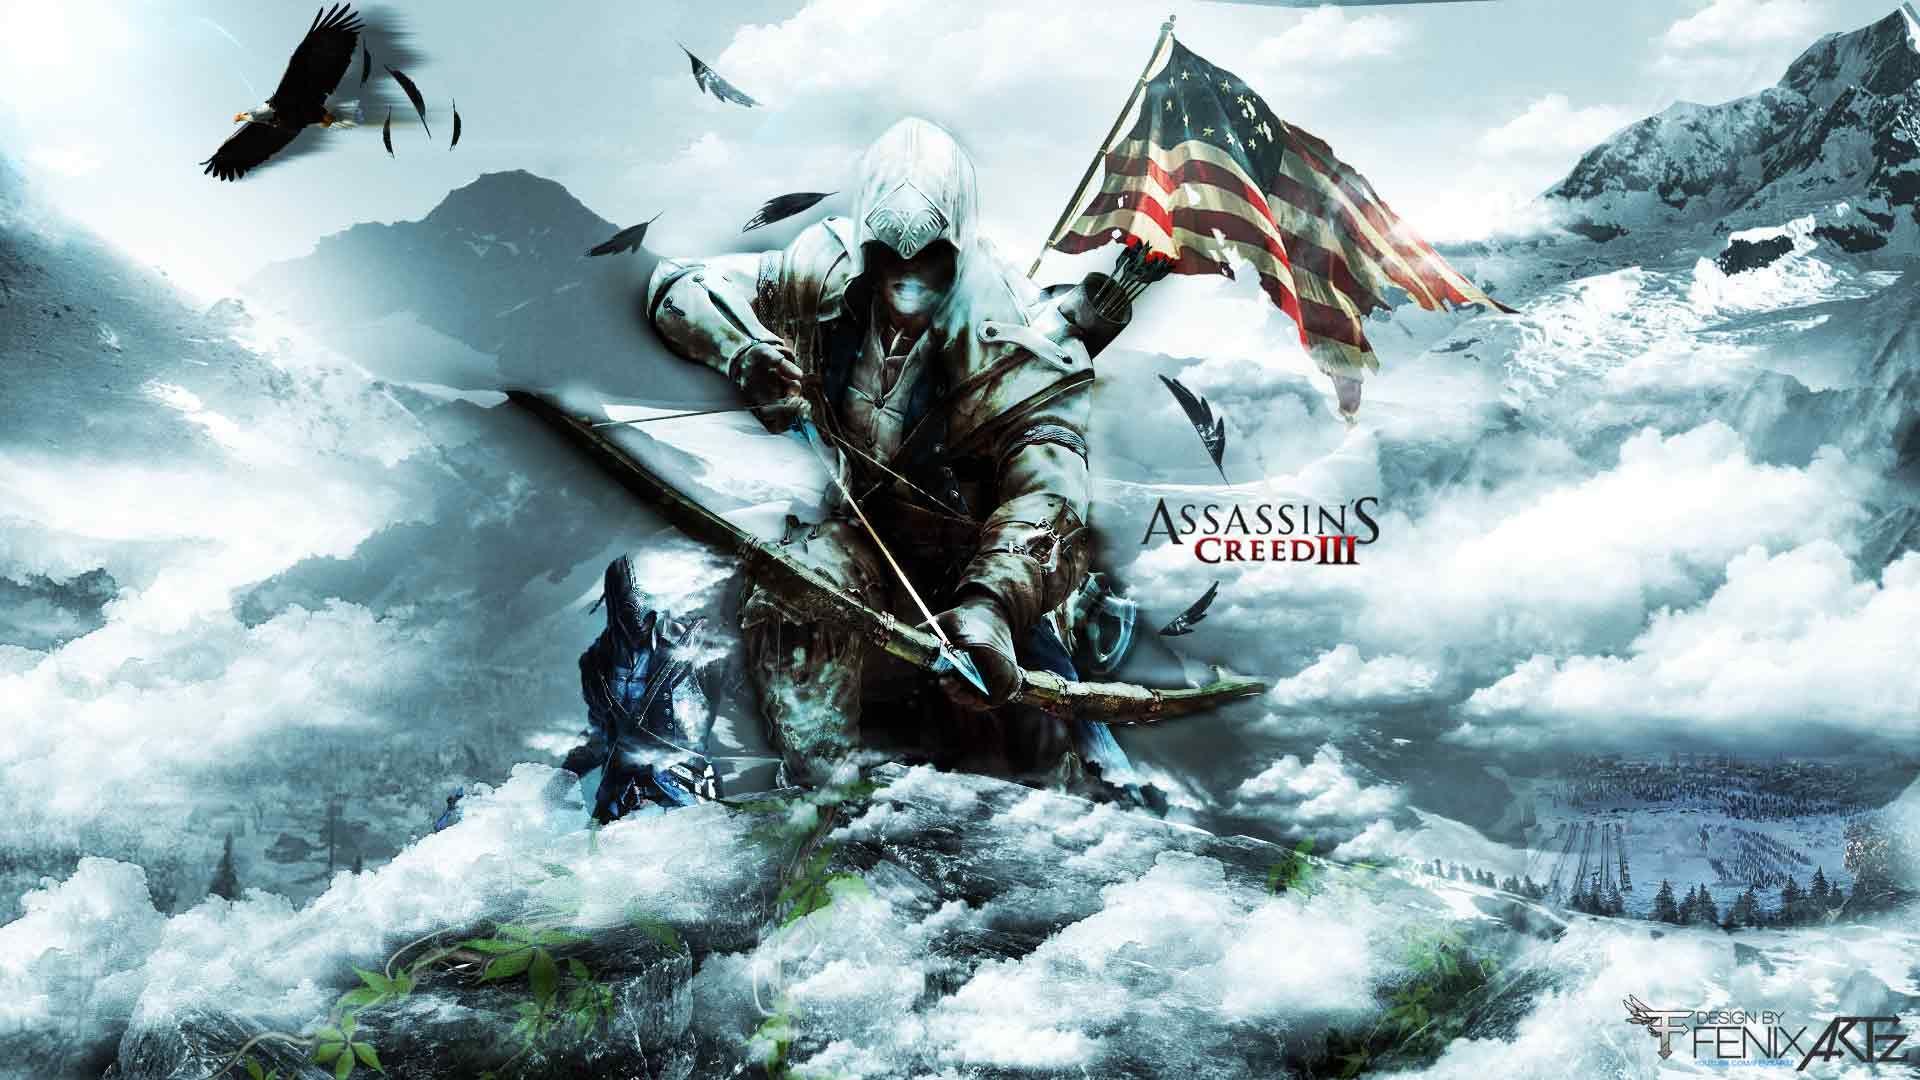 The Assassin S Wallpaper Assassin S Creed 3 Assassins Creed 3 Assassin S Creed Assassin S Creed Wallpaper